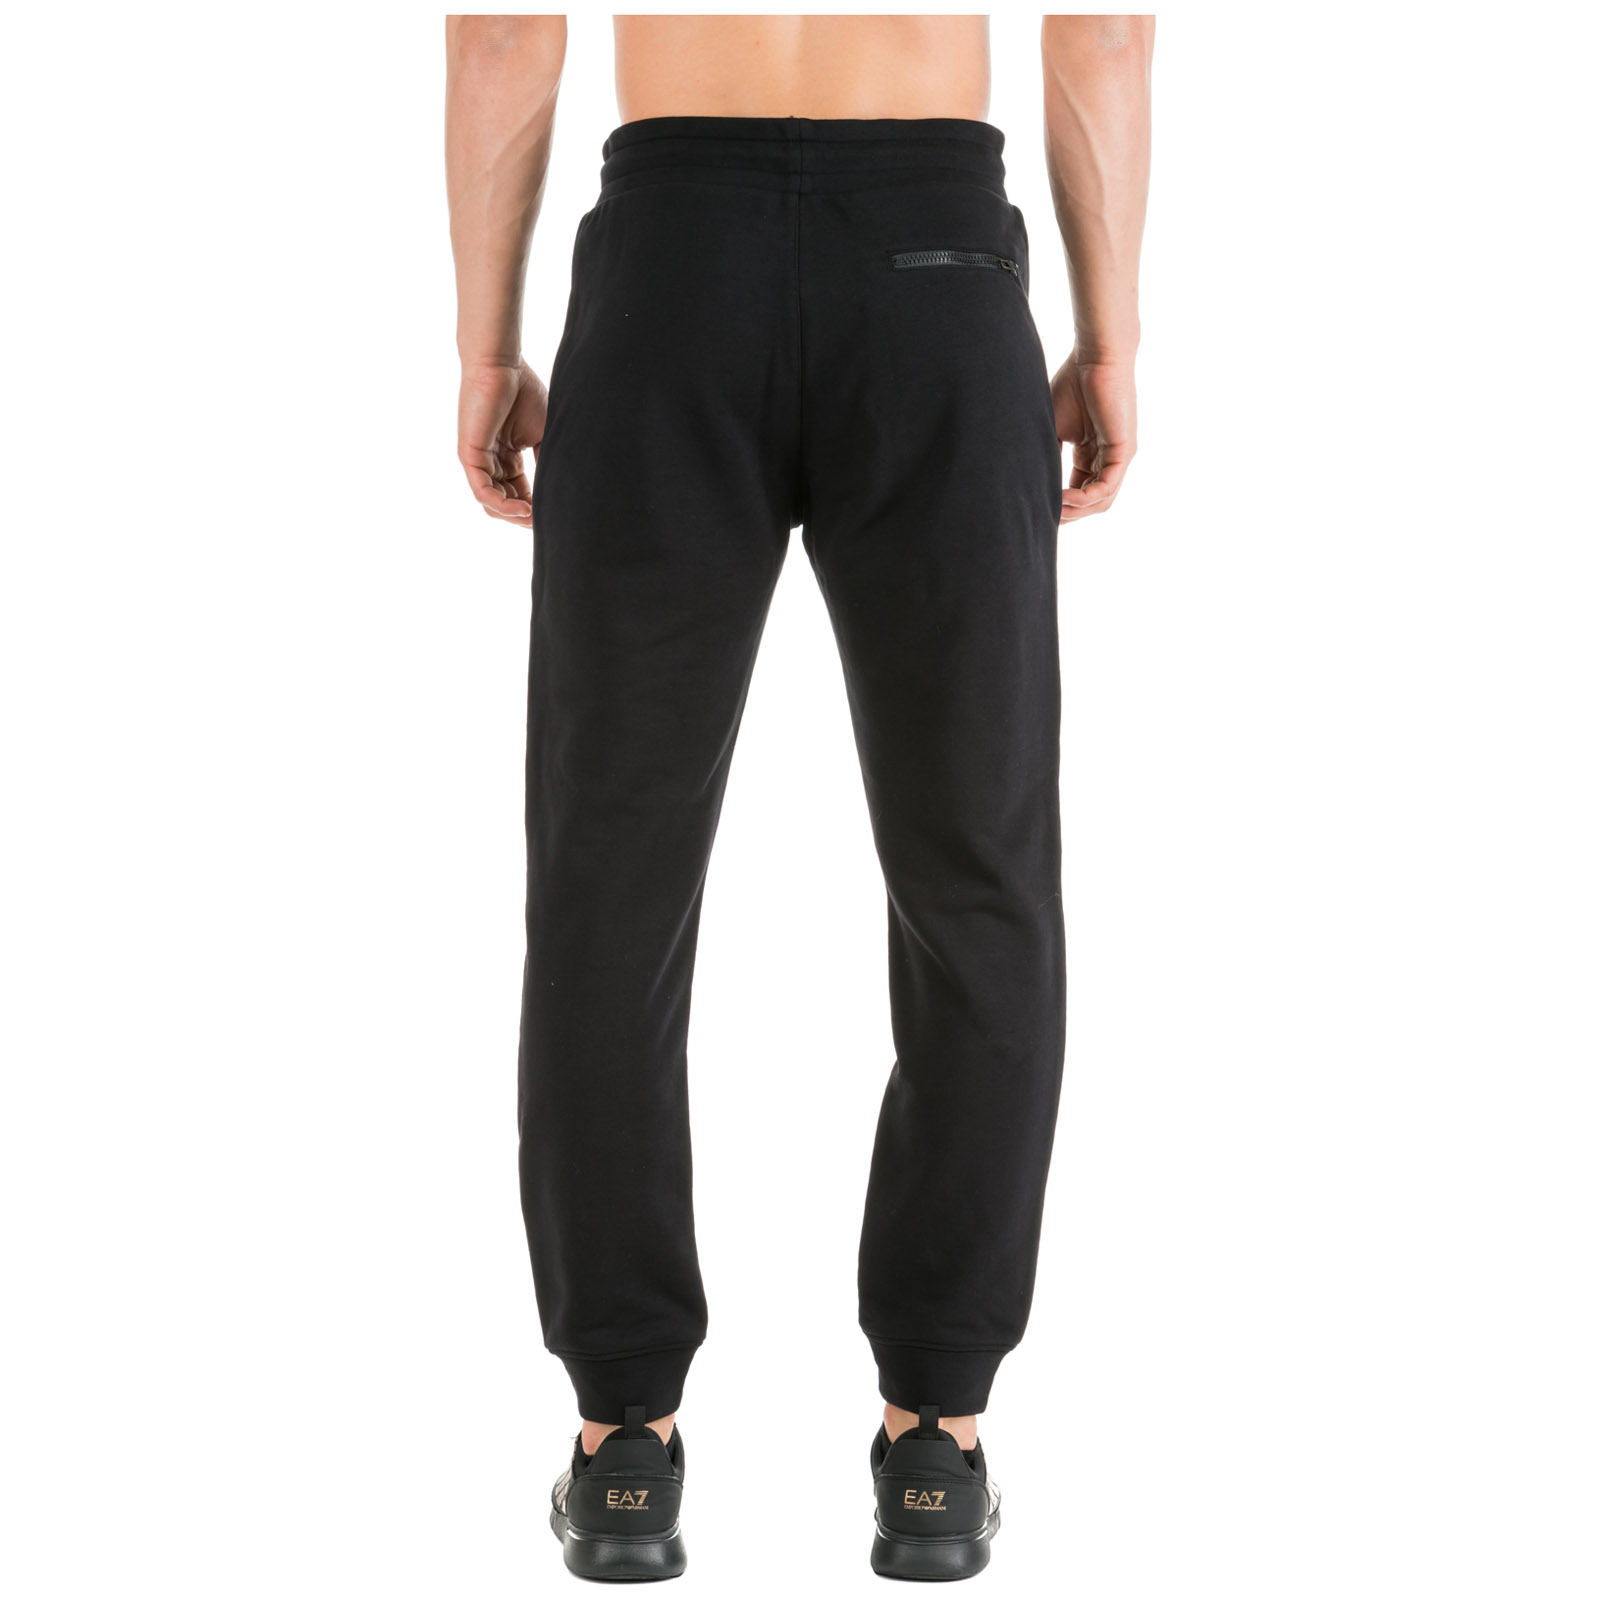 dfb4453701 Pantaloni tuta uomo regular fit